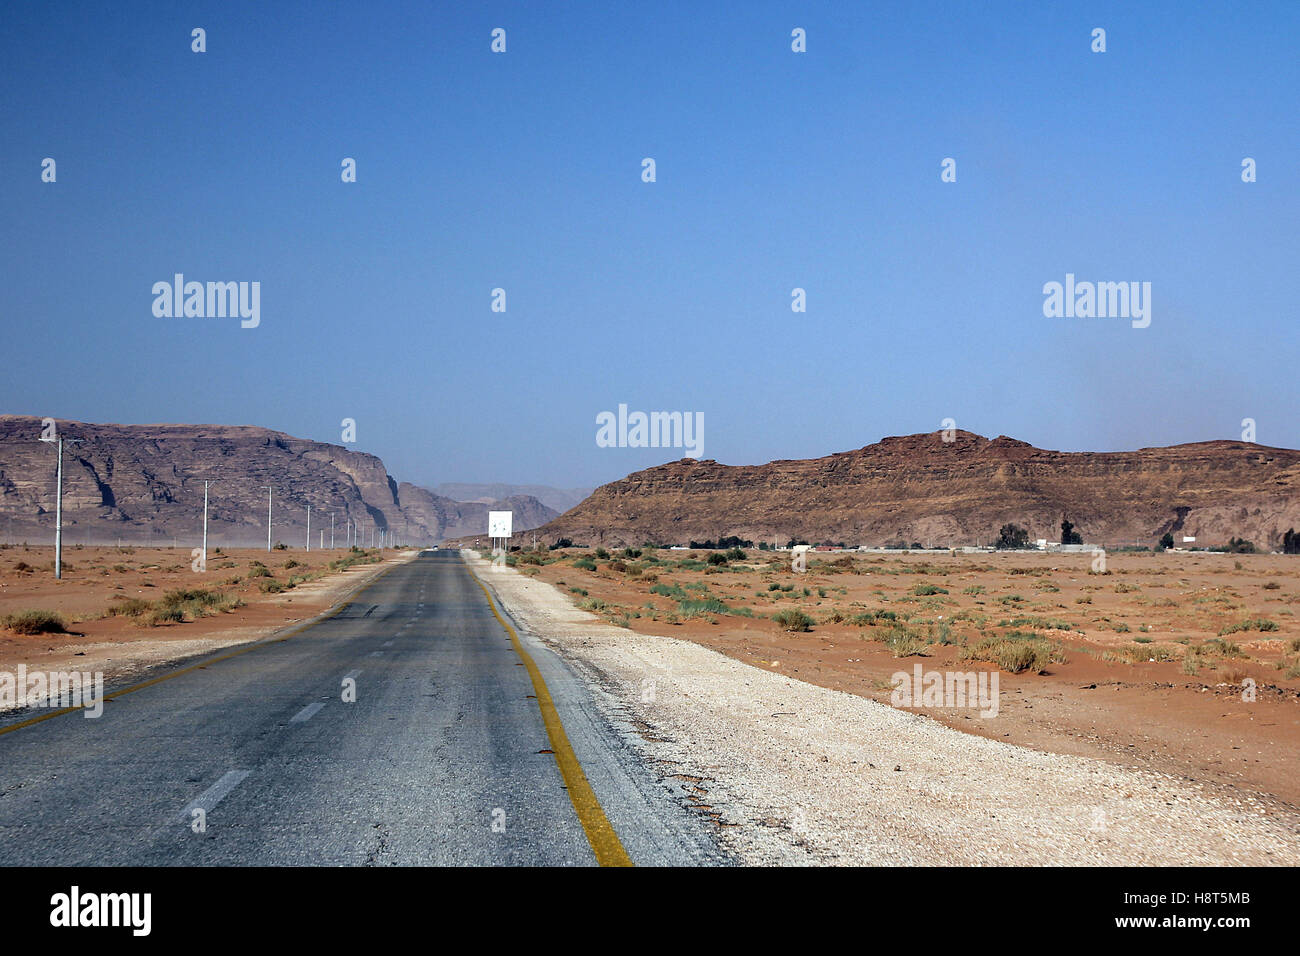 Desert road to, Valley of Wadi Rum, desert in Jordan - Stock Image